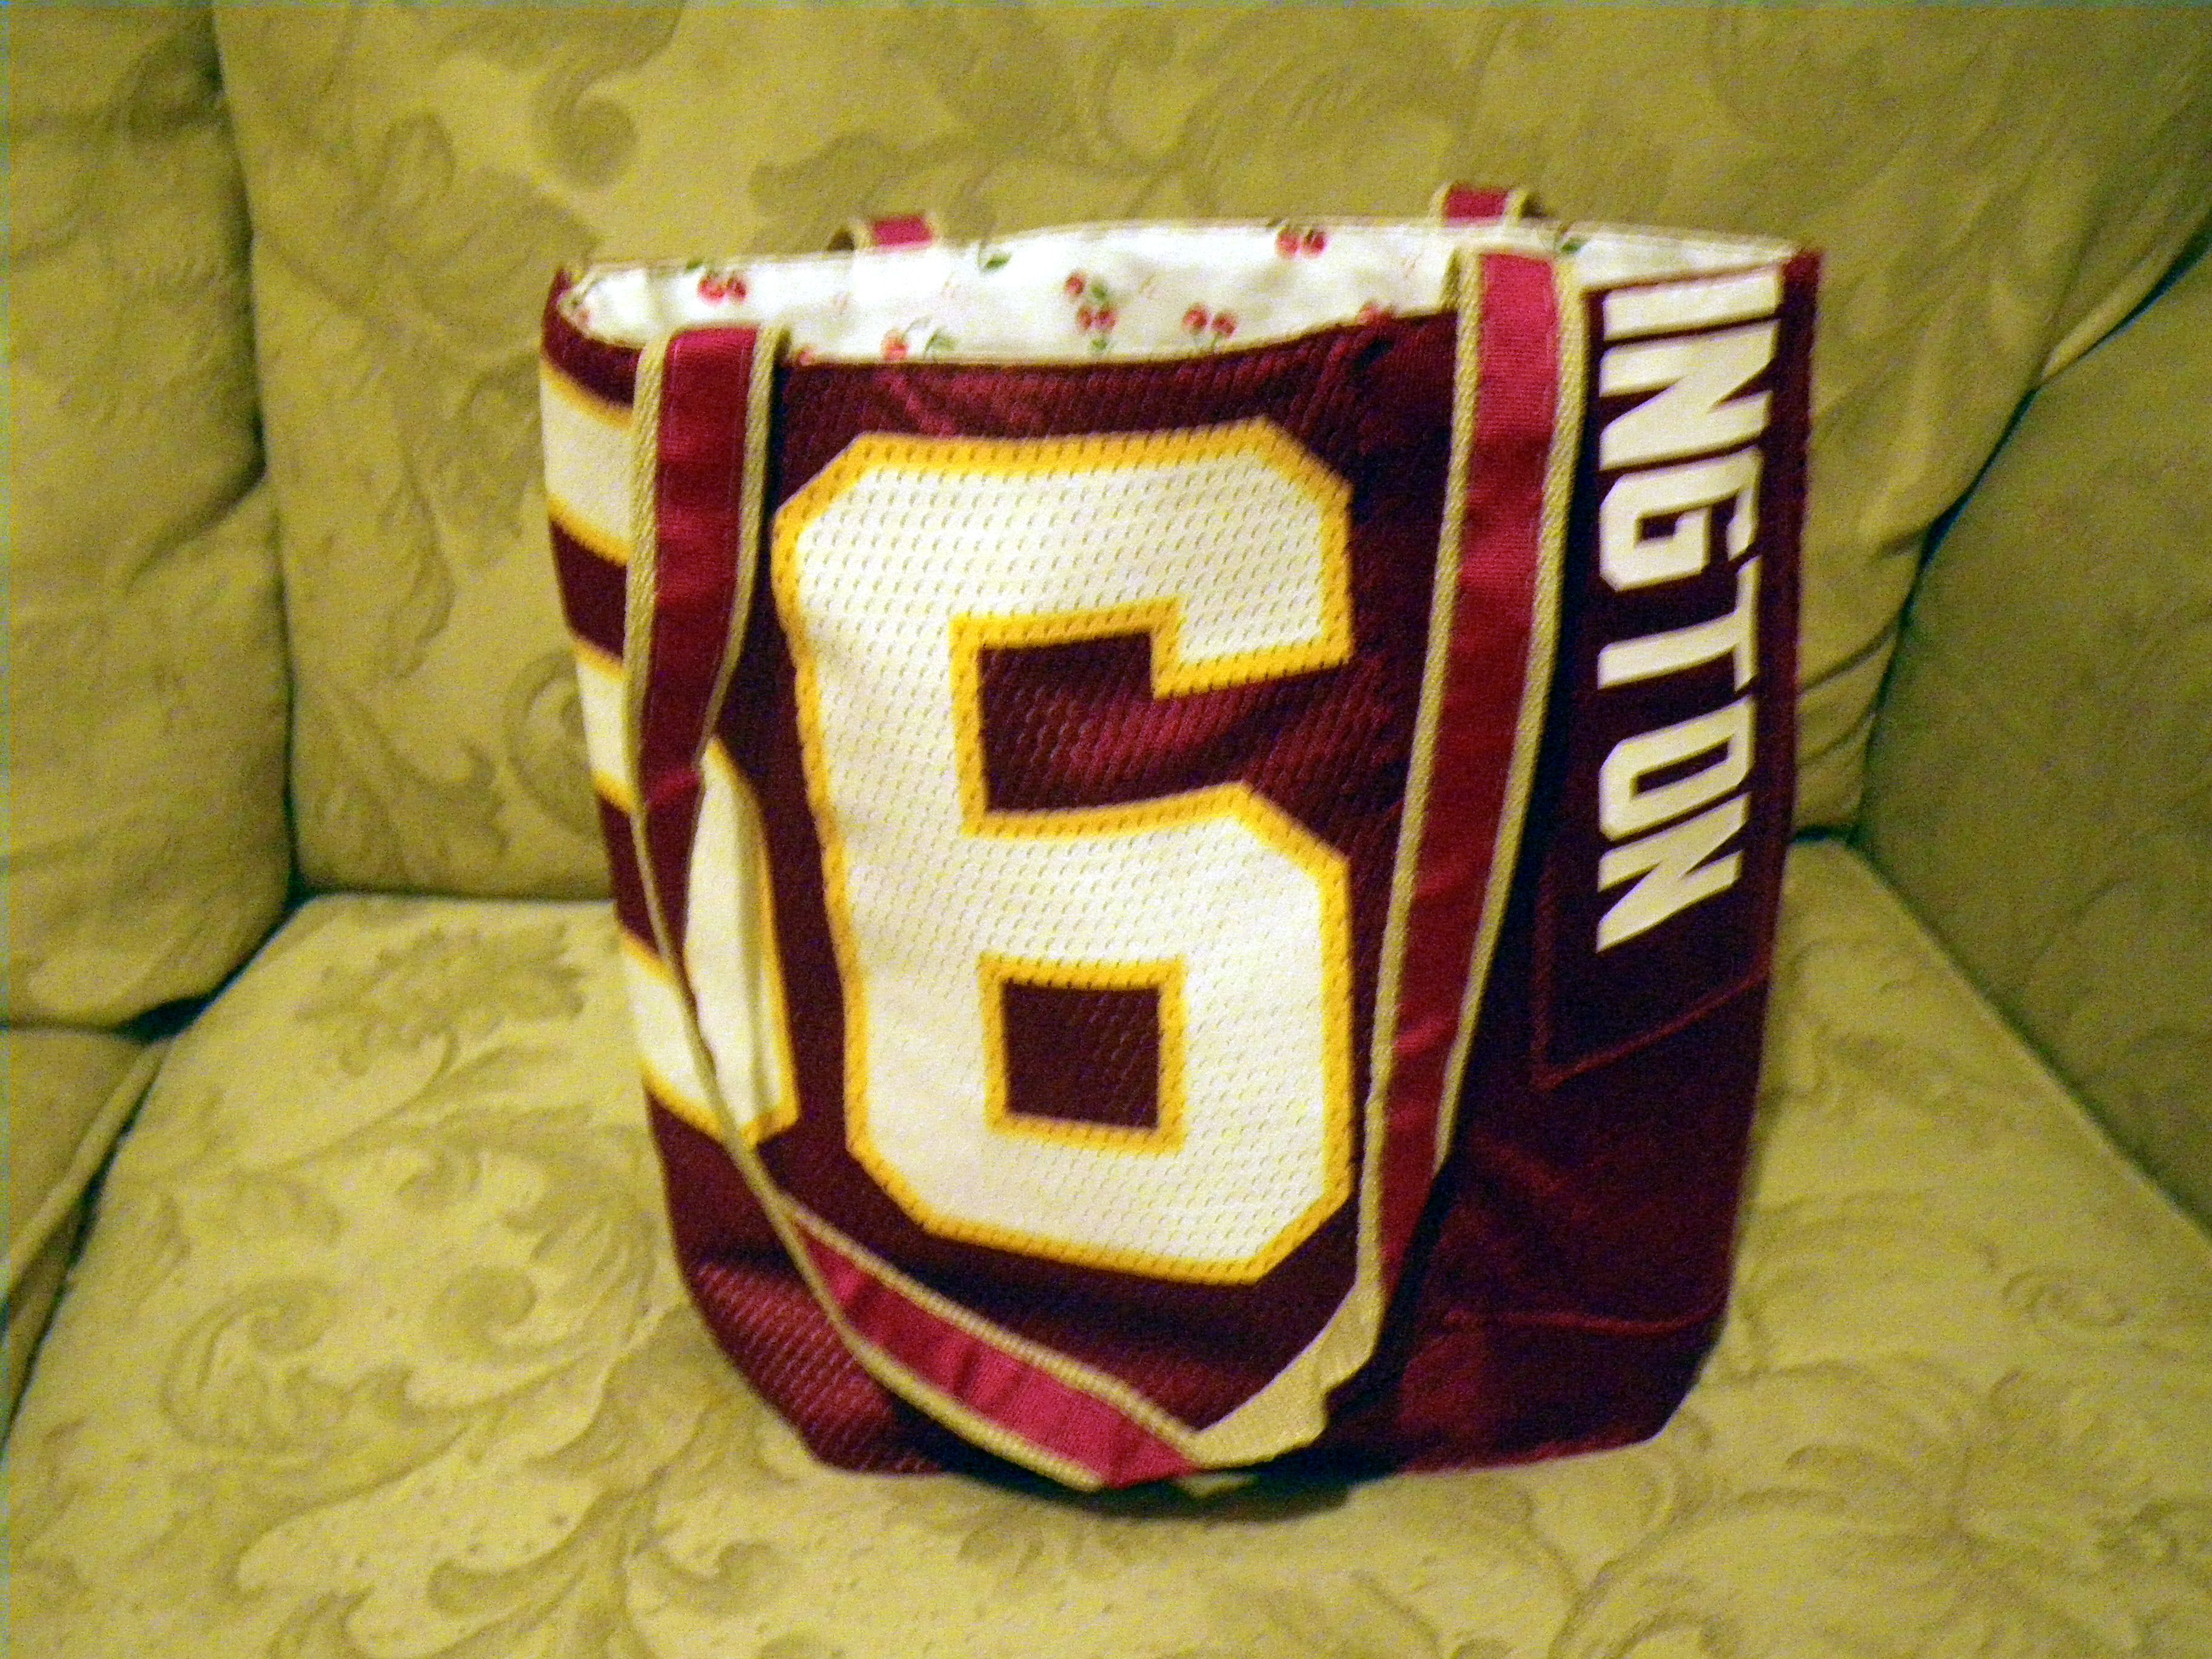 re-use old football jerseys by kelly crooker 88c656ef9